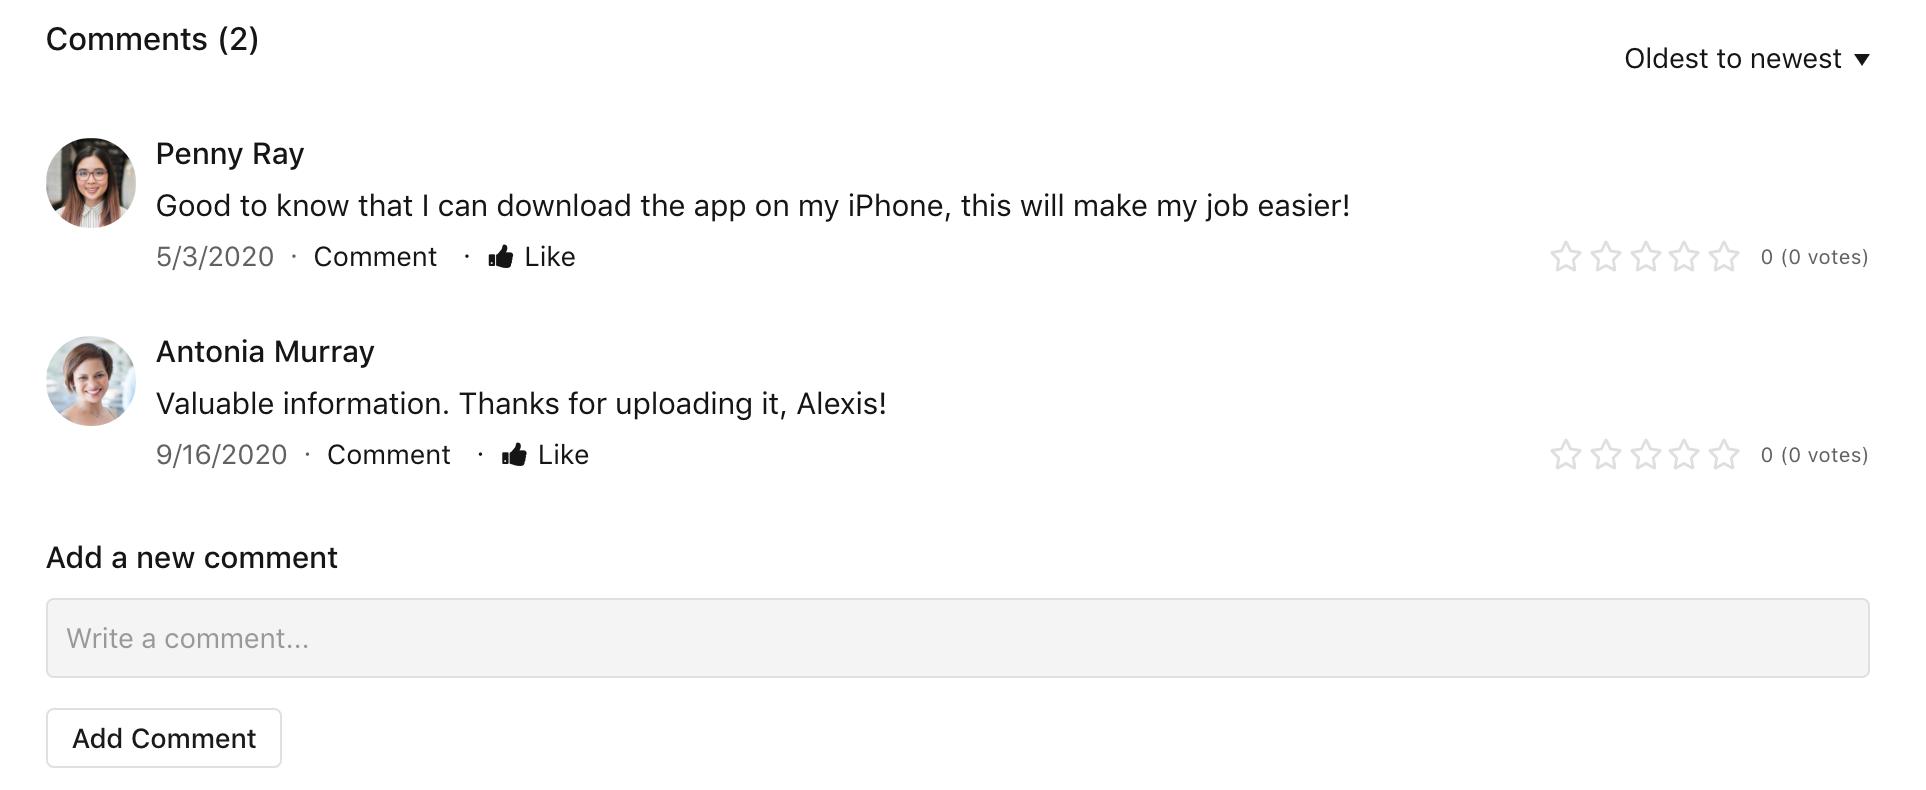 File comments